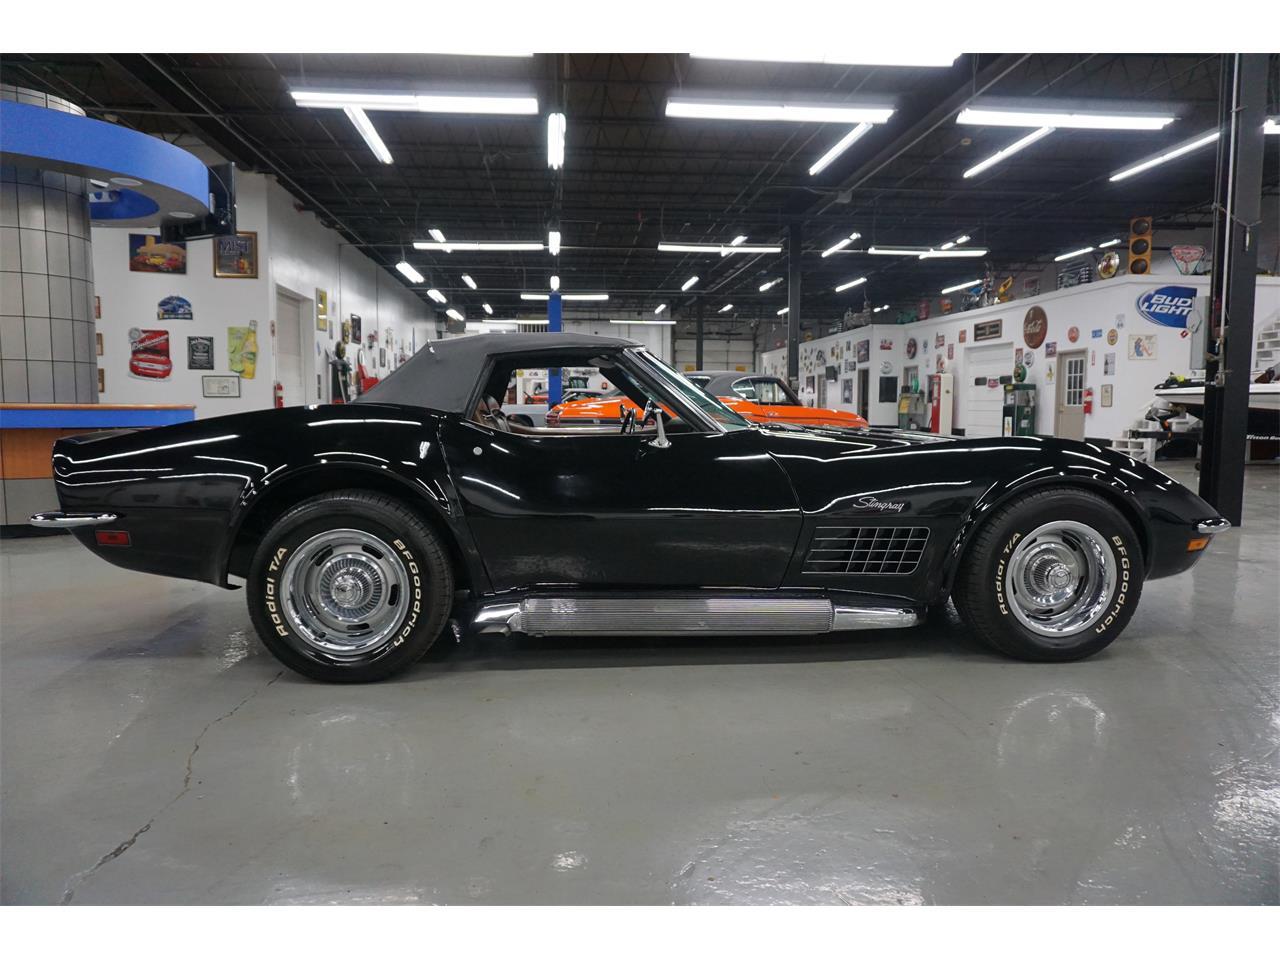 1971 Chevrolet Corvette Stingray (CC-1387886) for sale in Glen Burnie, Maryland